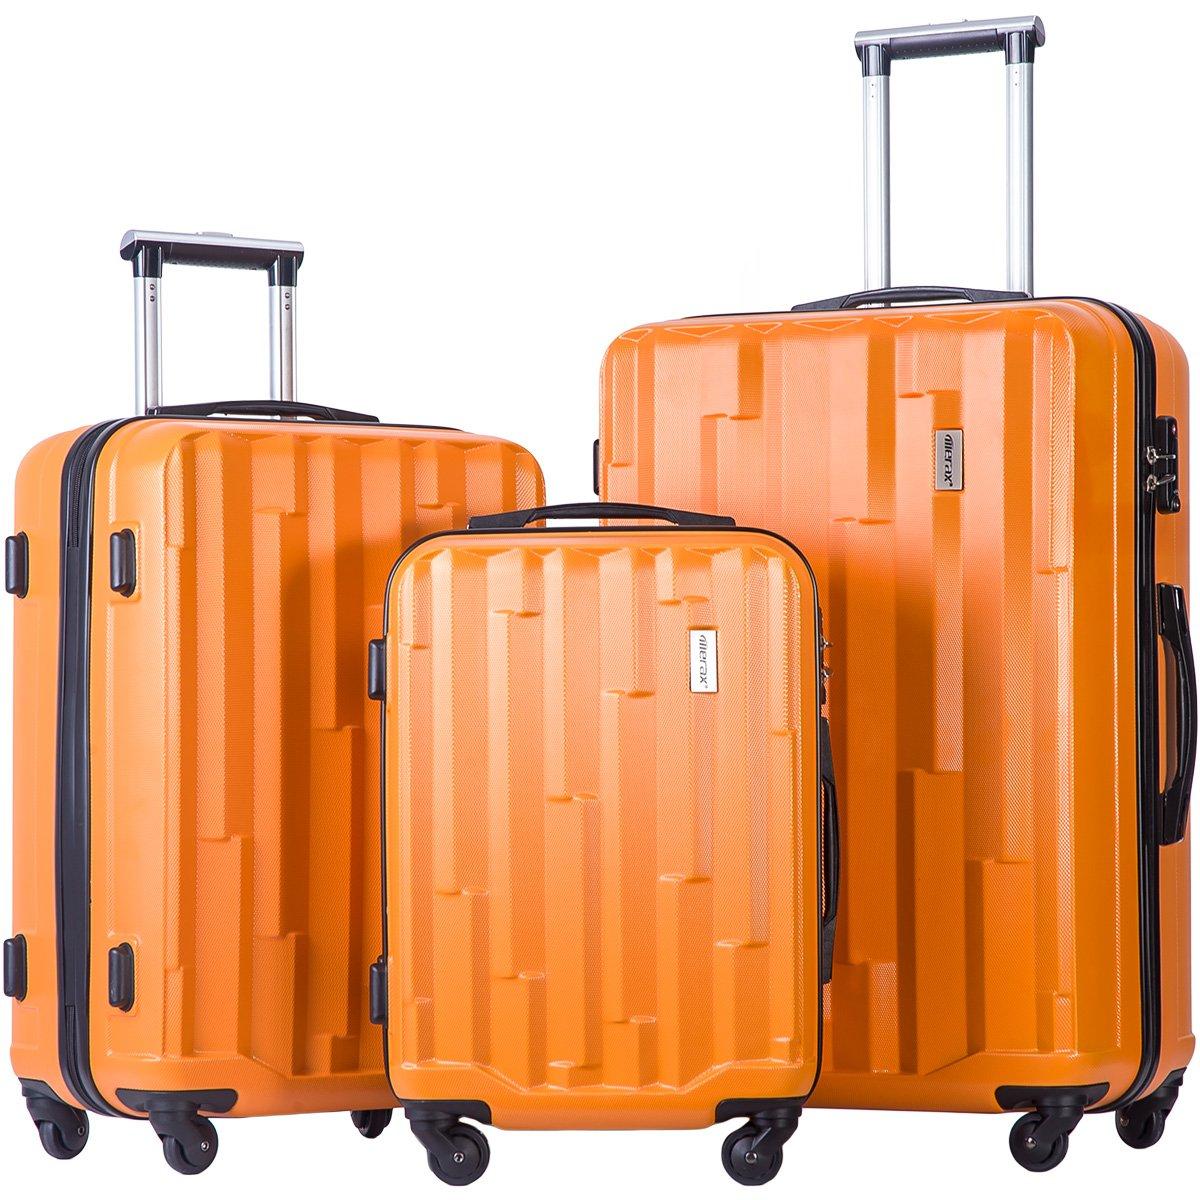 Merax Luggage set 3 piece luggages Suitcase with TSA lock (Orange) by Merax